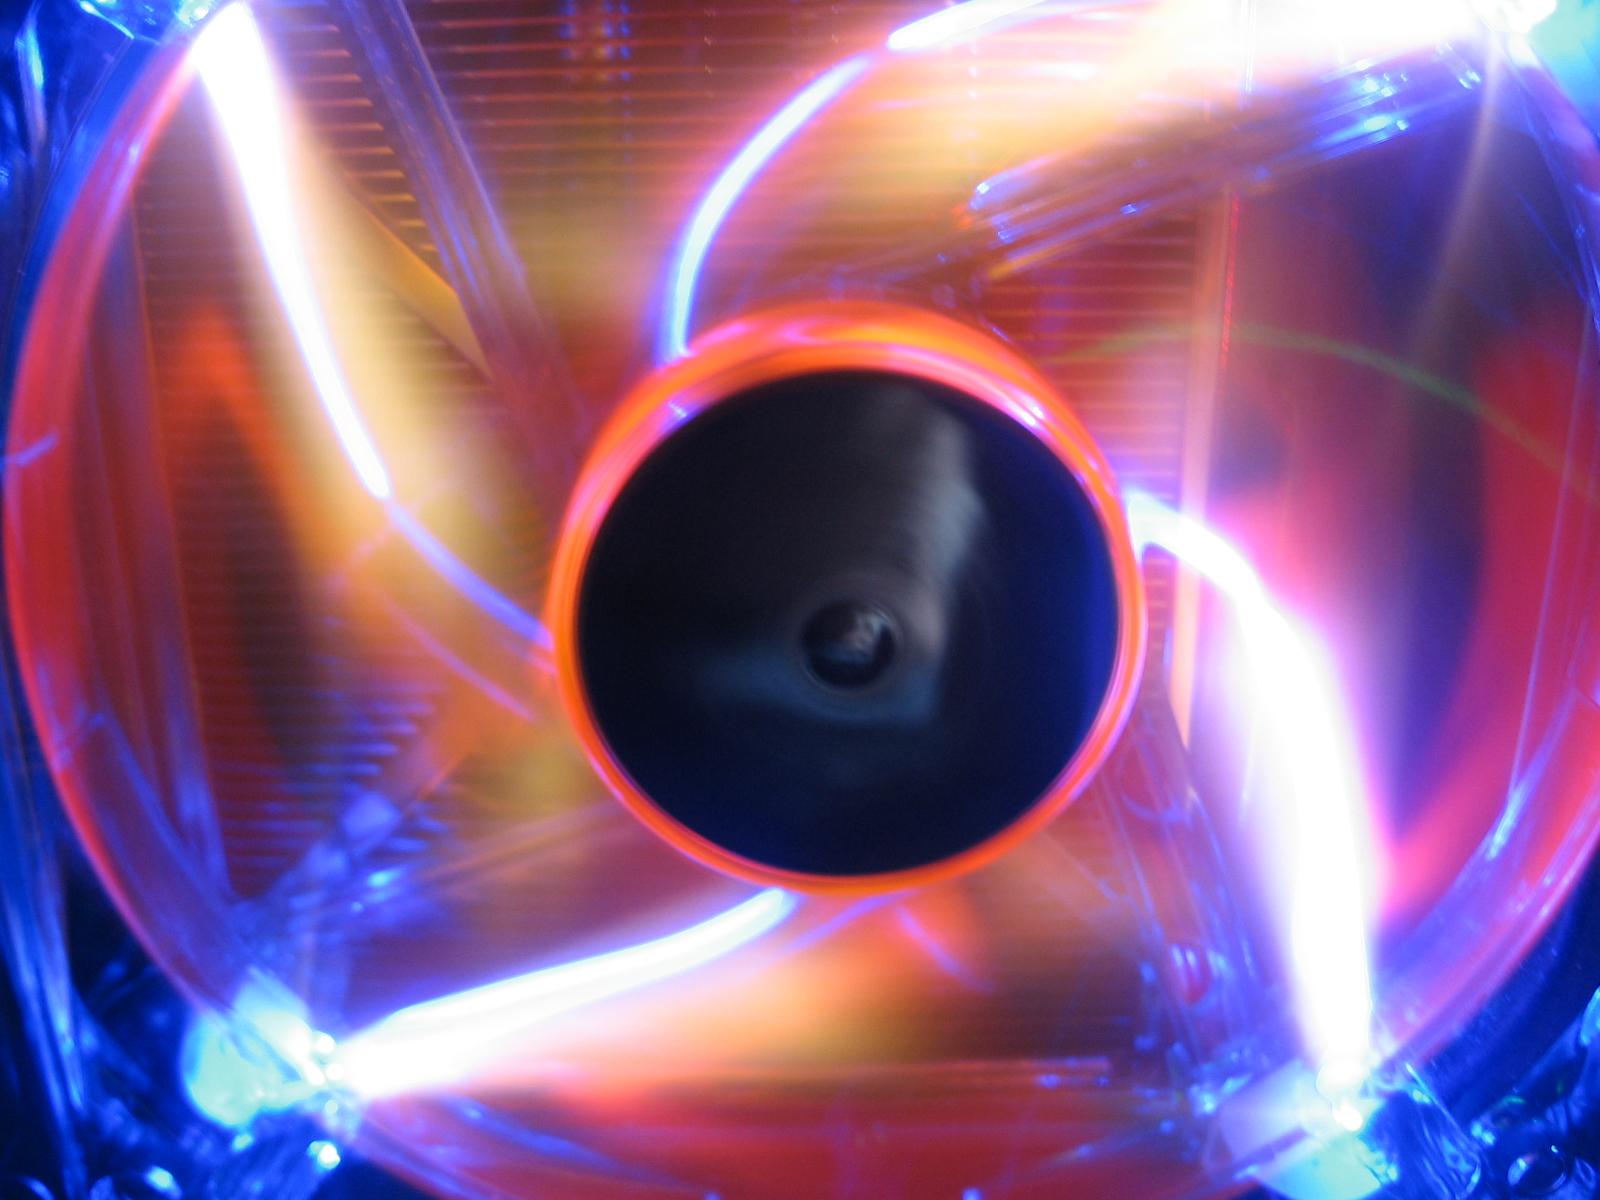 http://phothorizons.free.fr/GeminII%20055.jpg